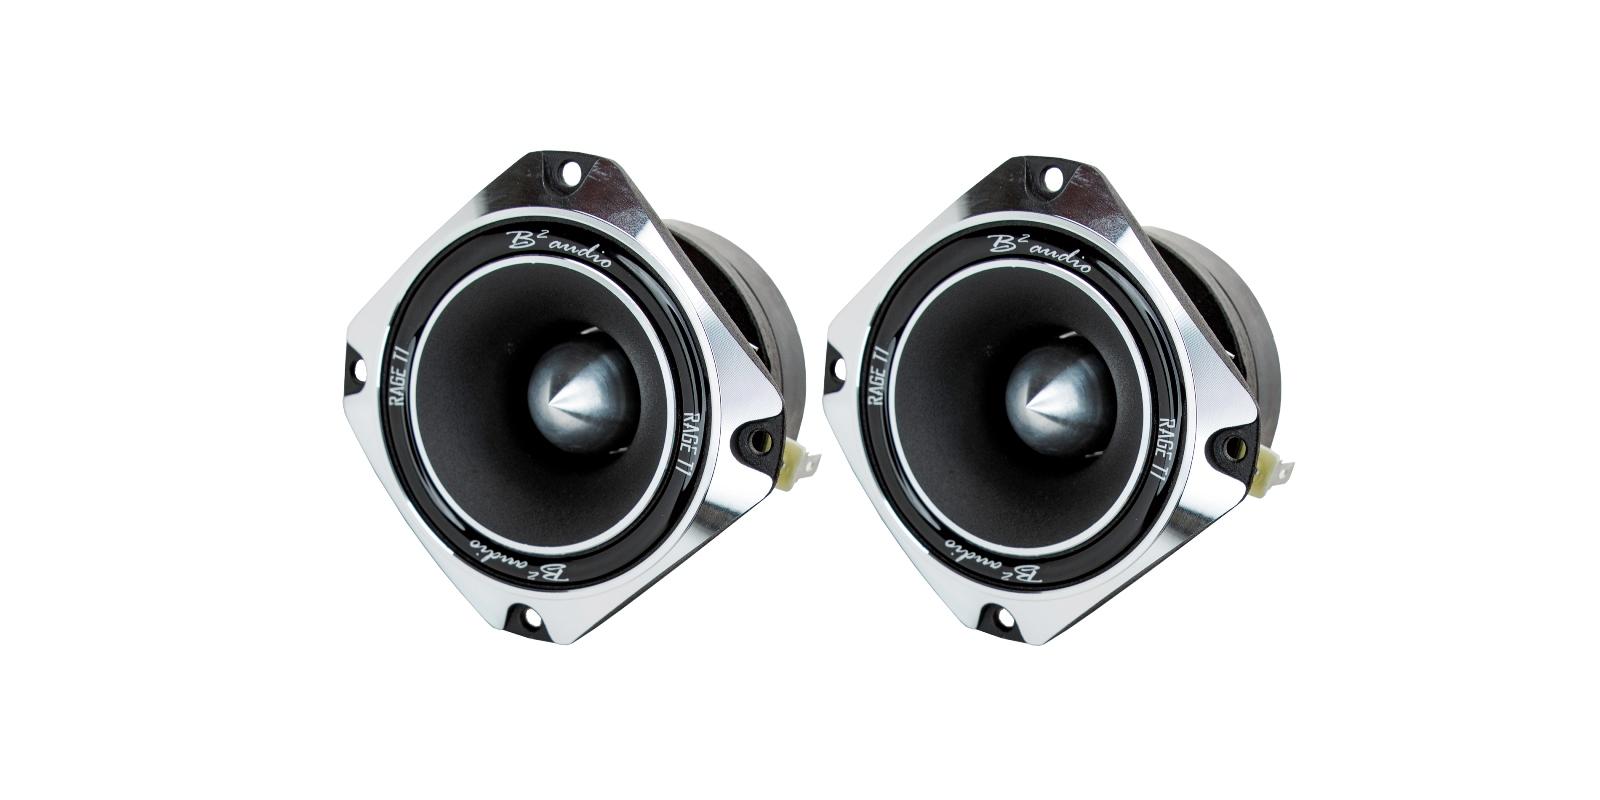 B2 audio RAGE T1